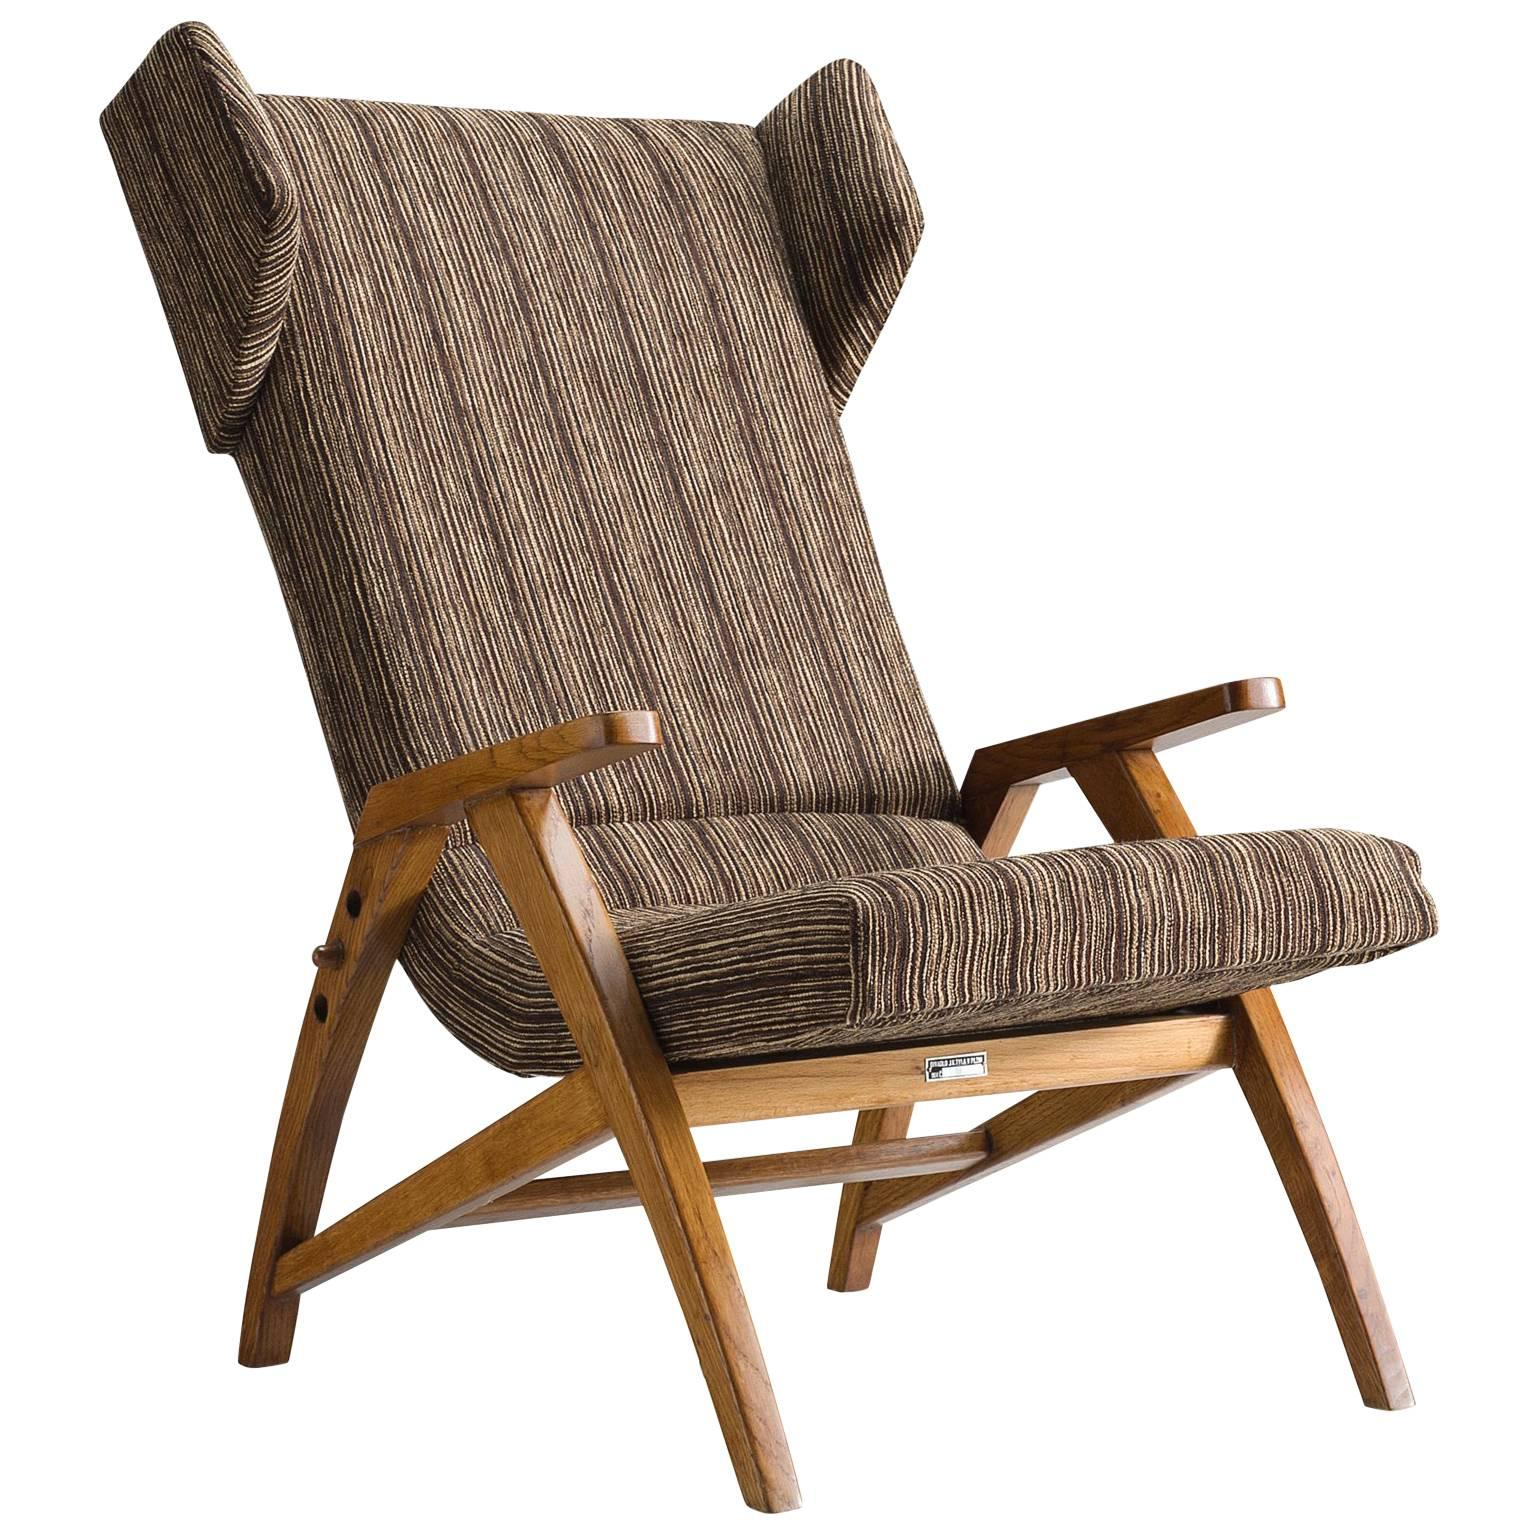 Reclining Wingback Chair in Solid Oak, 1940s